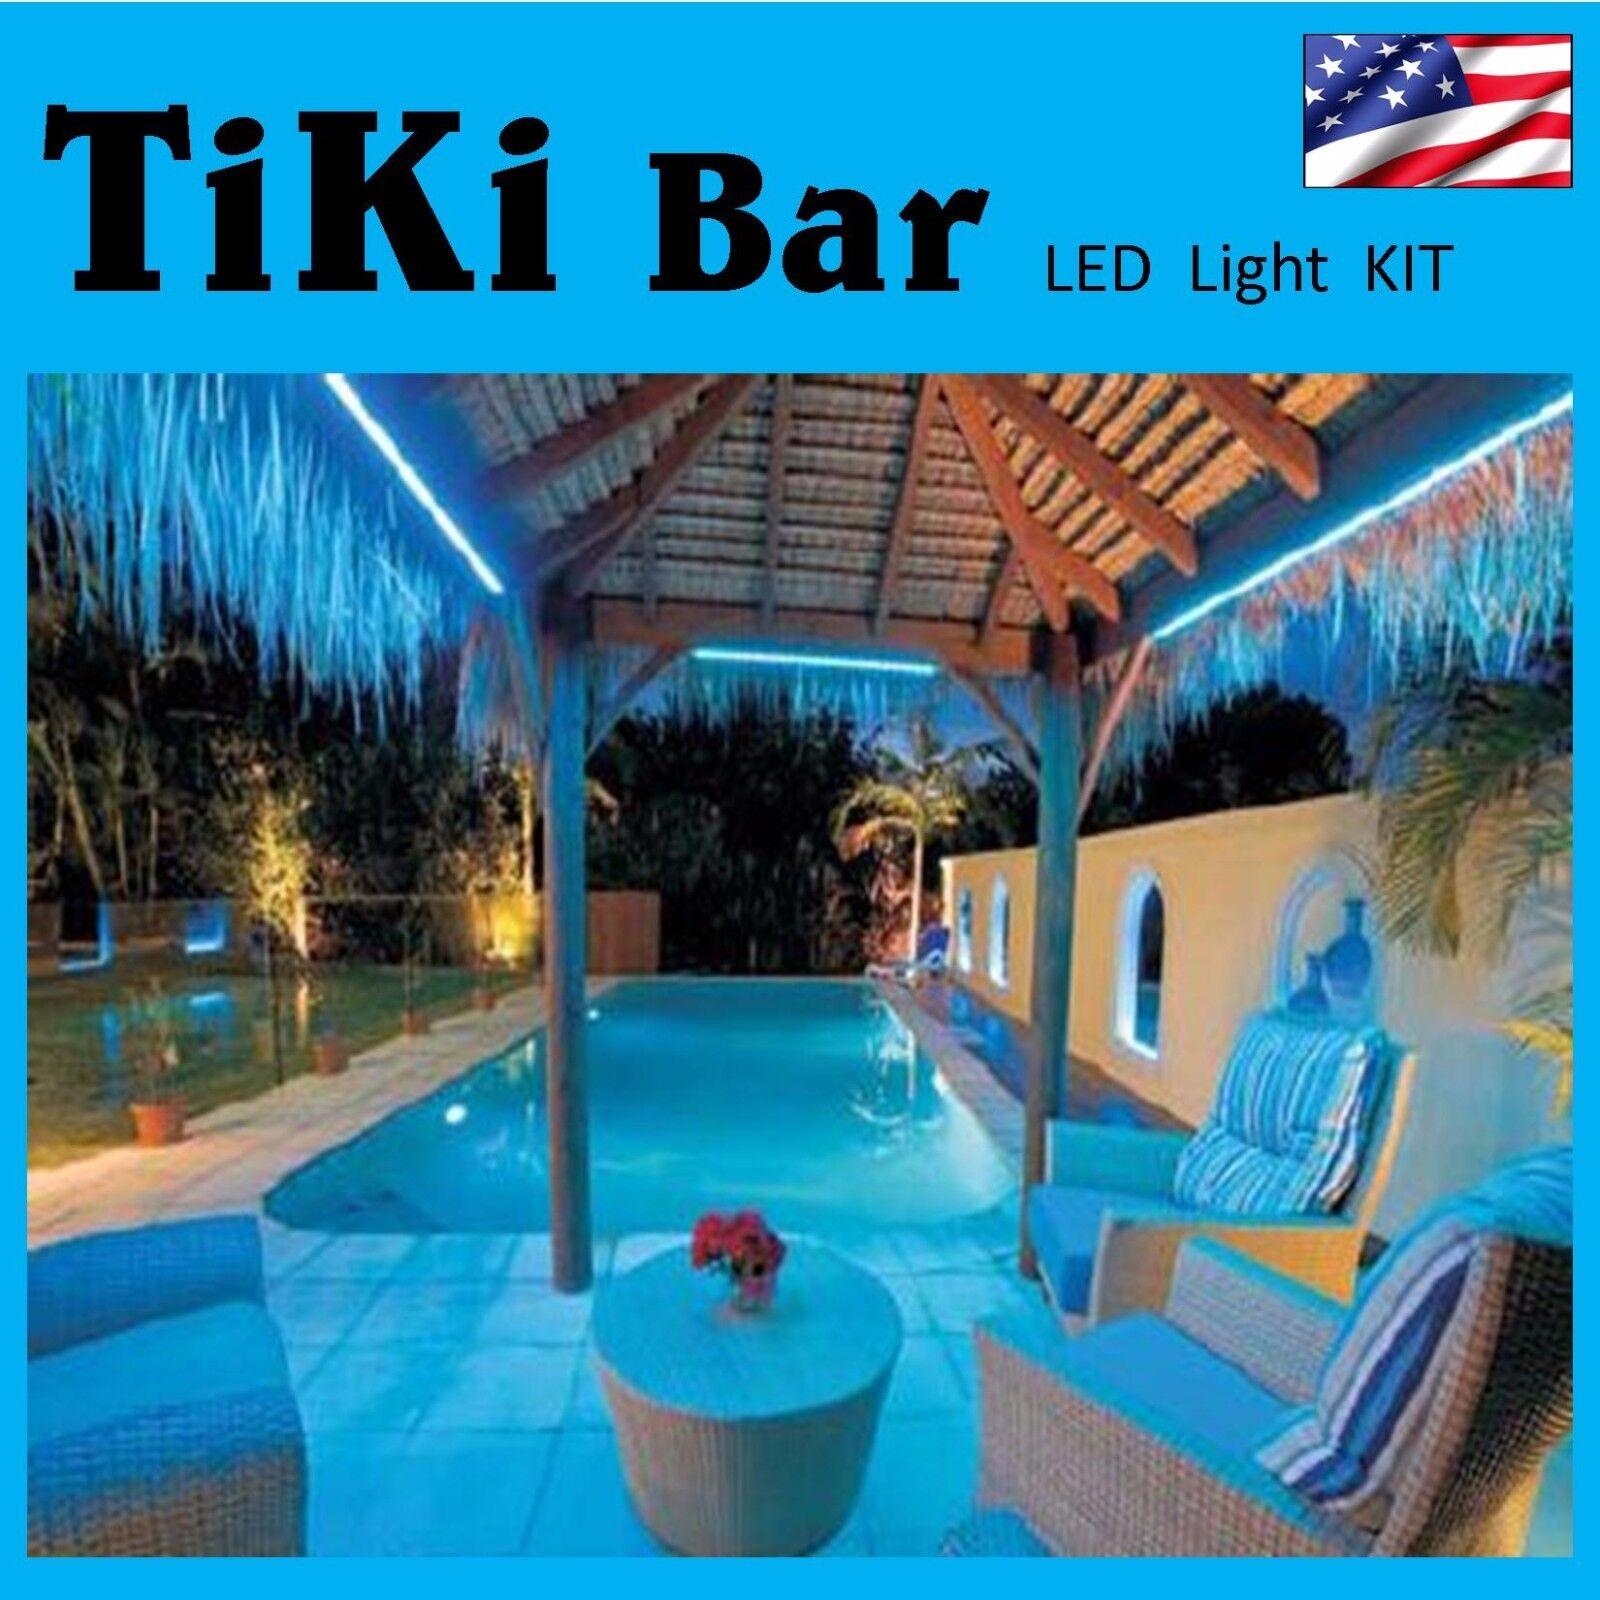 BEAUTIFUL Rainbow Farbe Changing Tiki Bar DECORATION lights - NEW deco